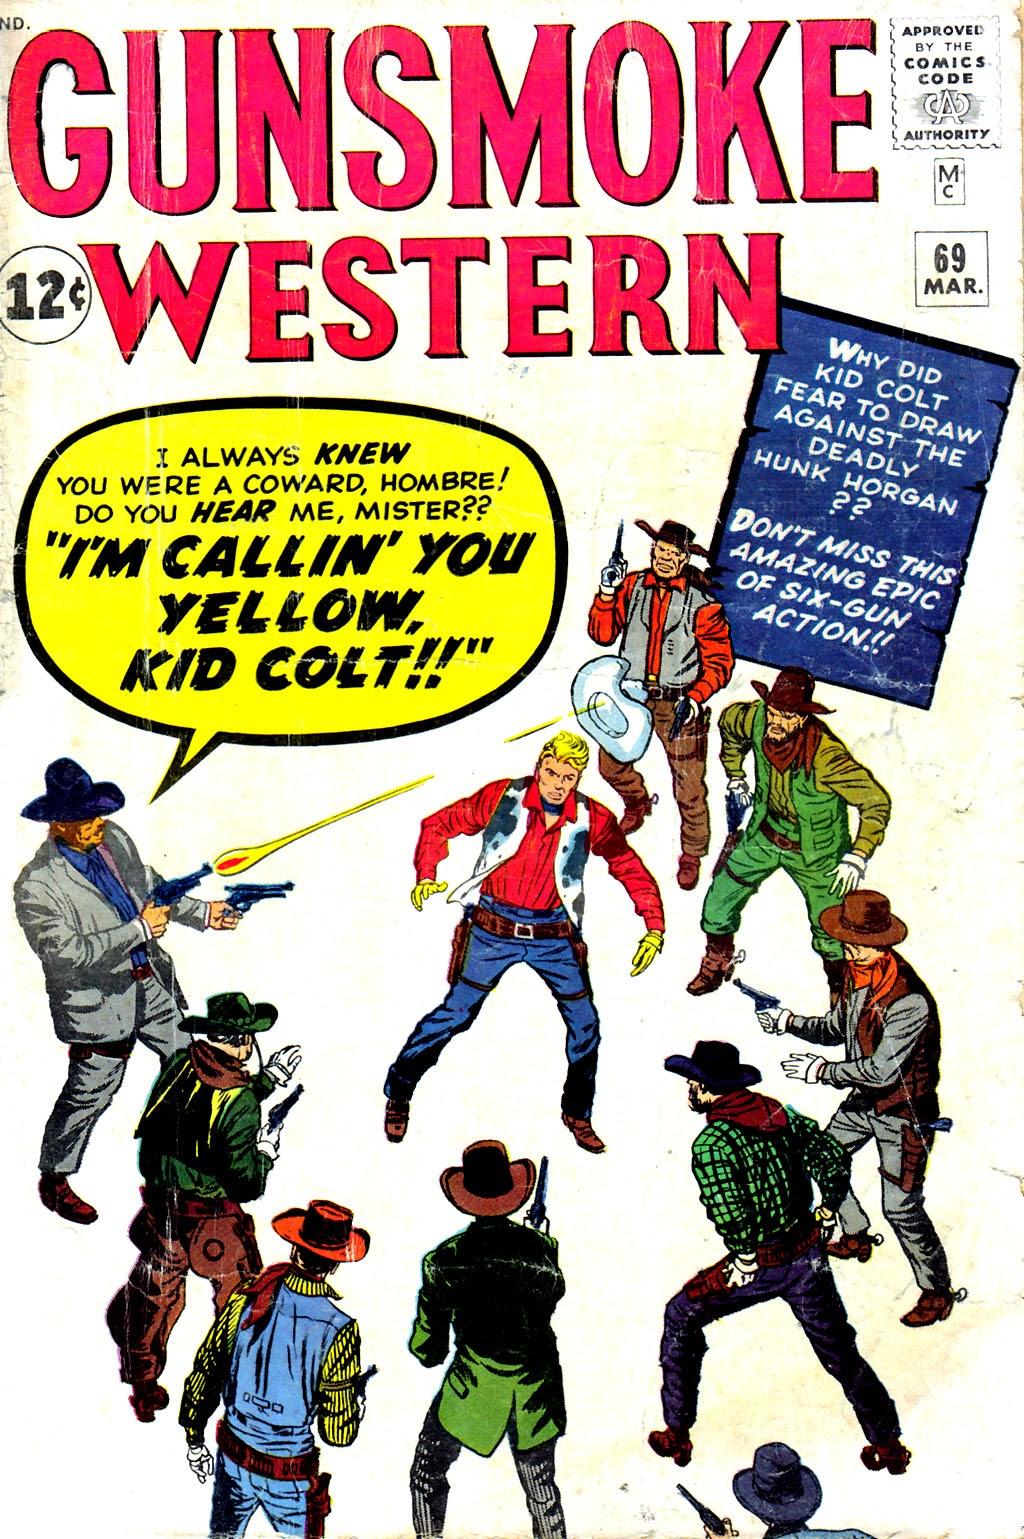 Gunsmoke Western 69 Page 1